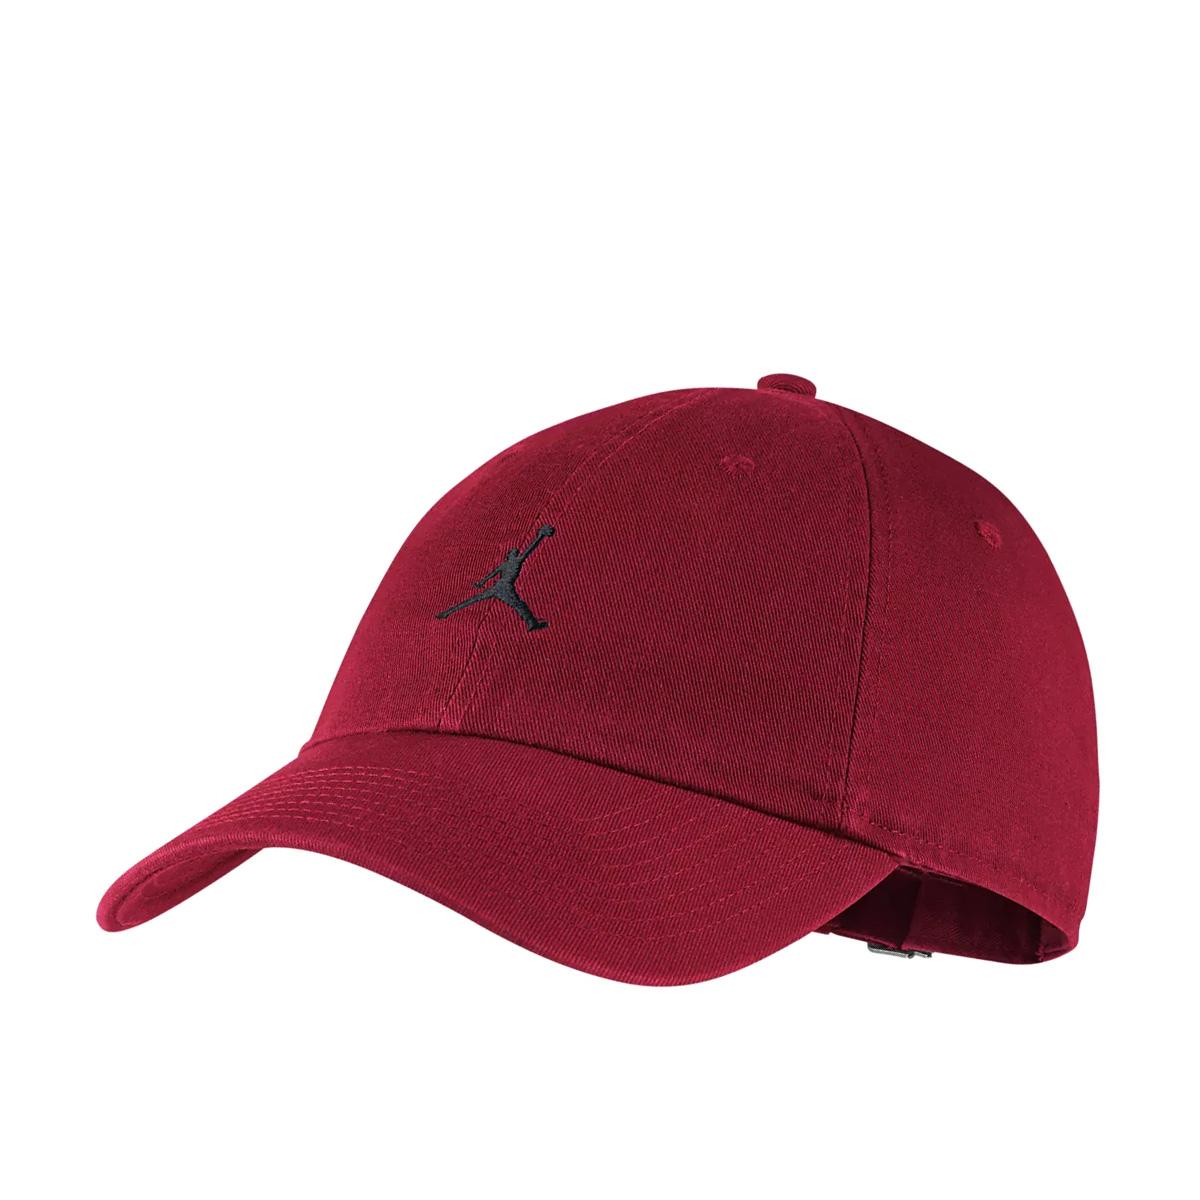 d44b01c31 NIKE HERITAGE 86 JUMPMAN FLOPPY CAP Nike Jordan heritage 86 jump man floppy  cap RED ar2117-687